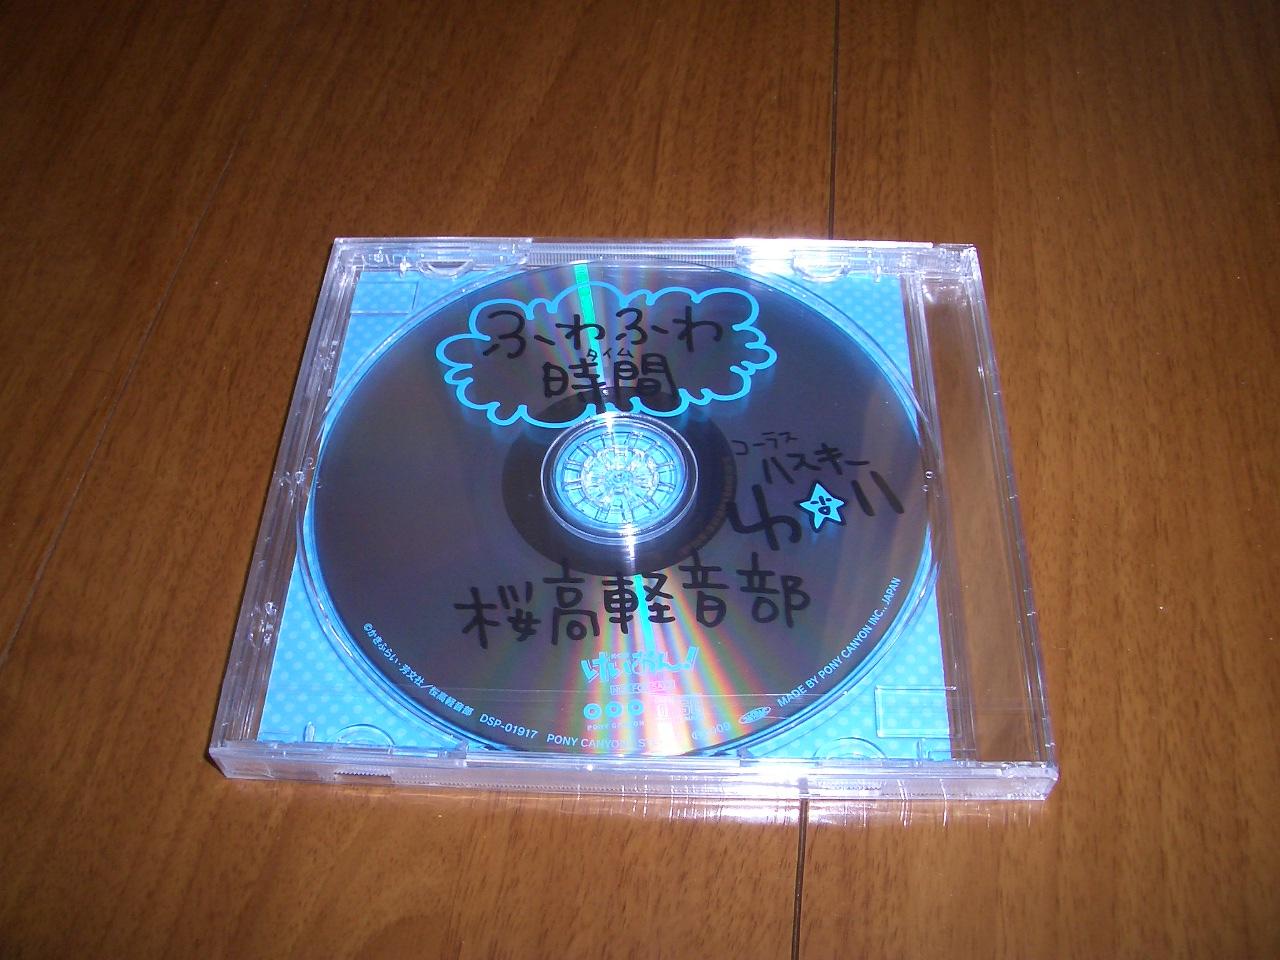 http://www.daimonzi.com/img/husky-yui-rear.JPG